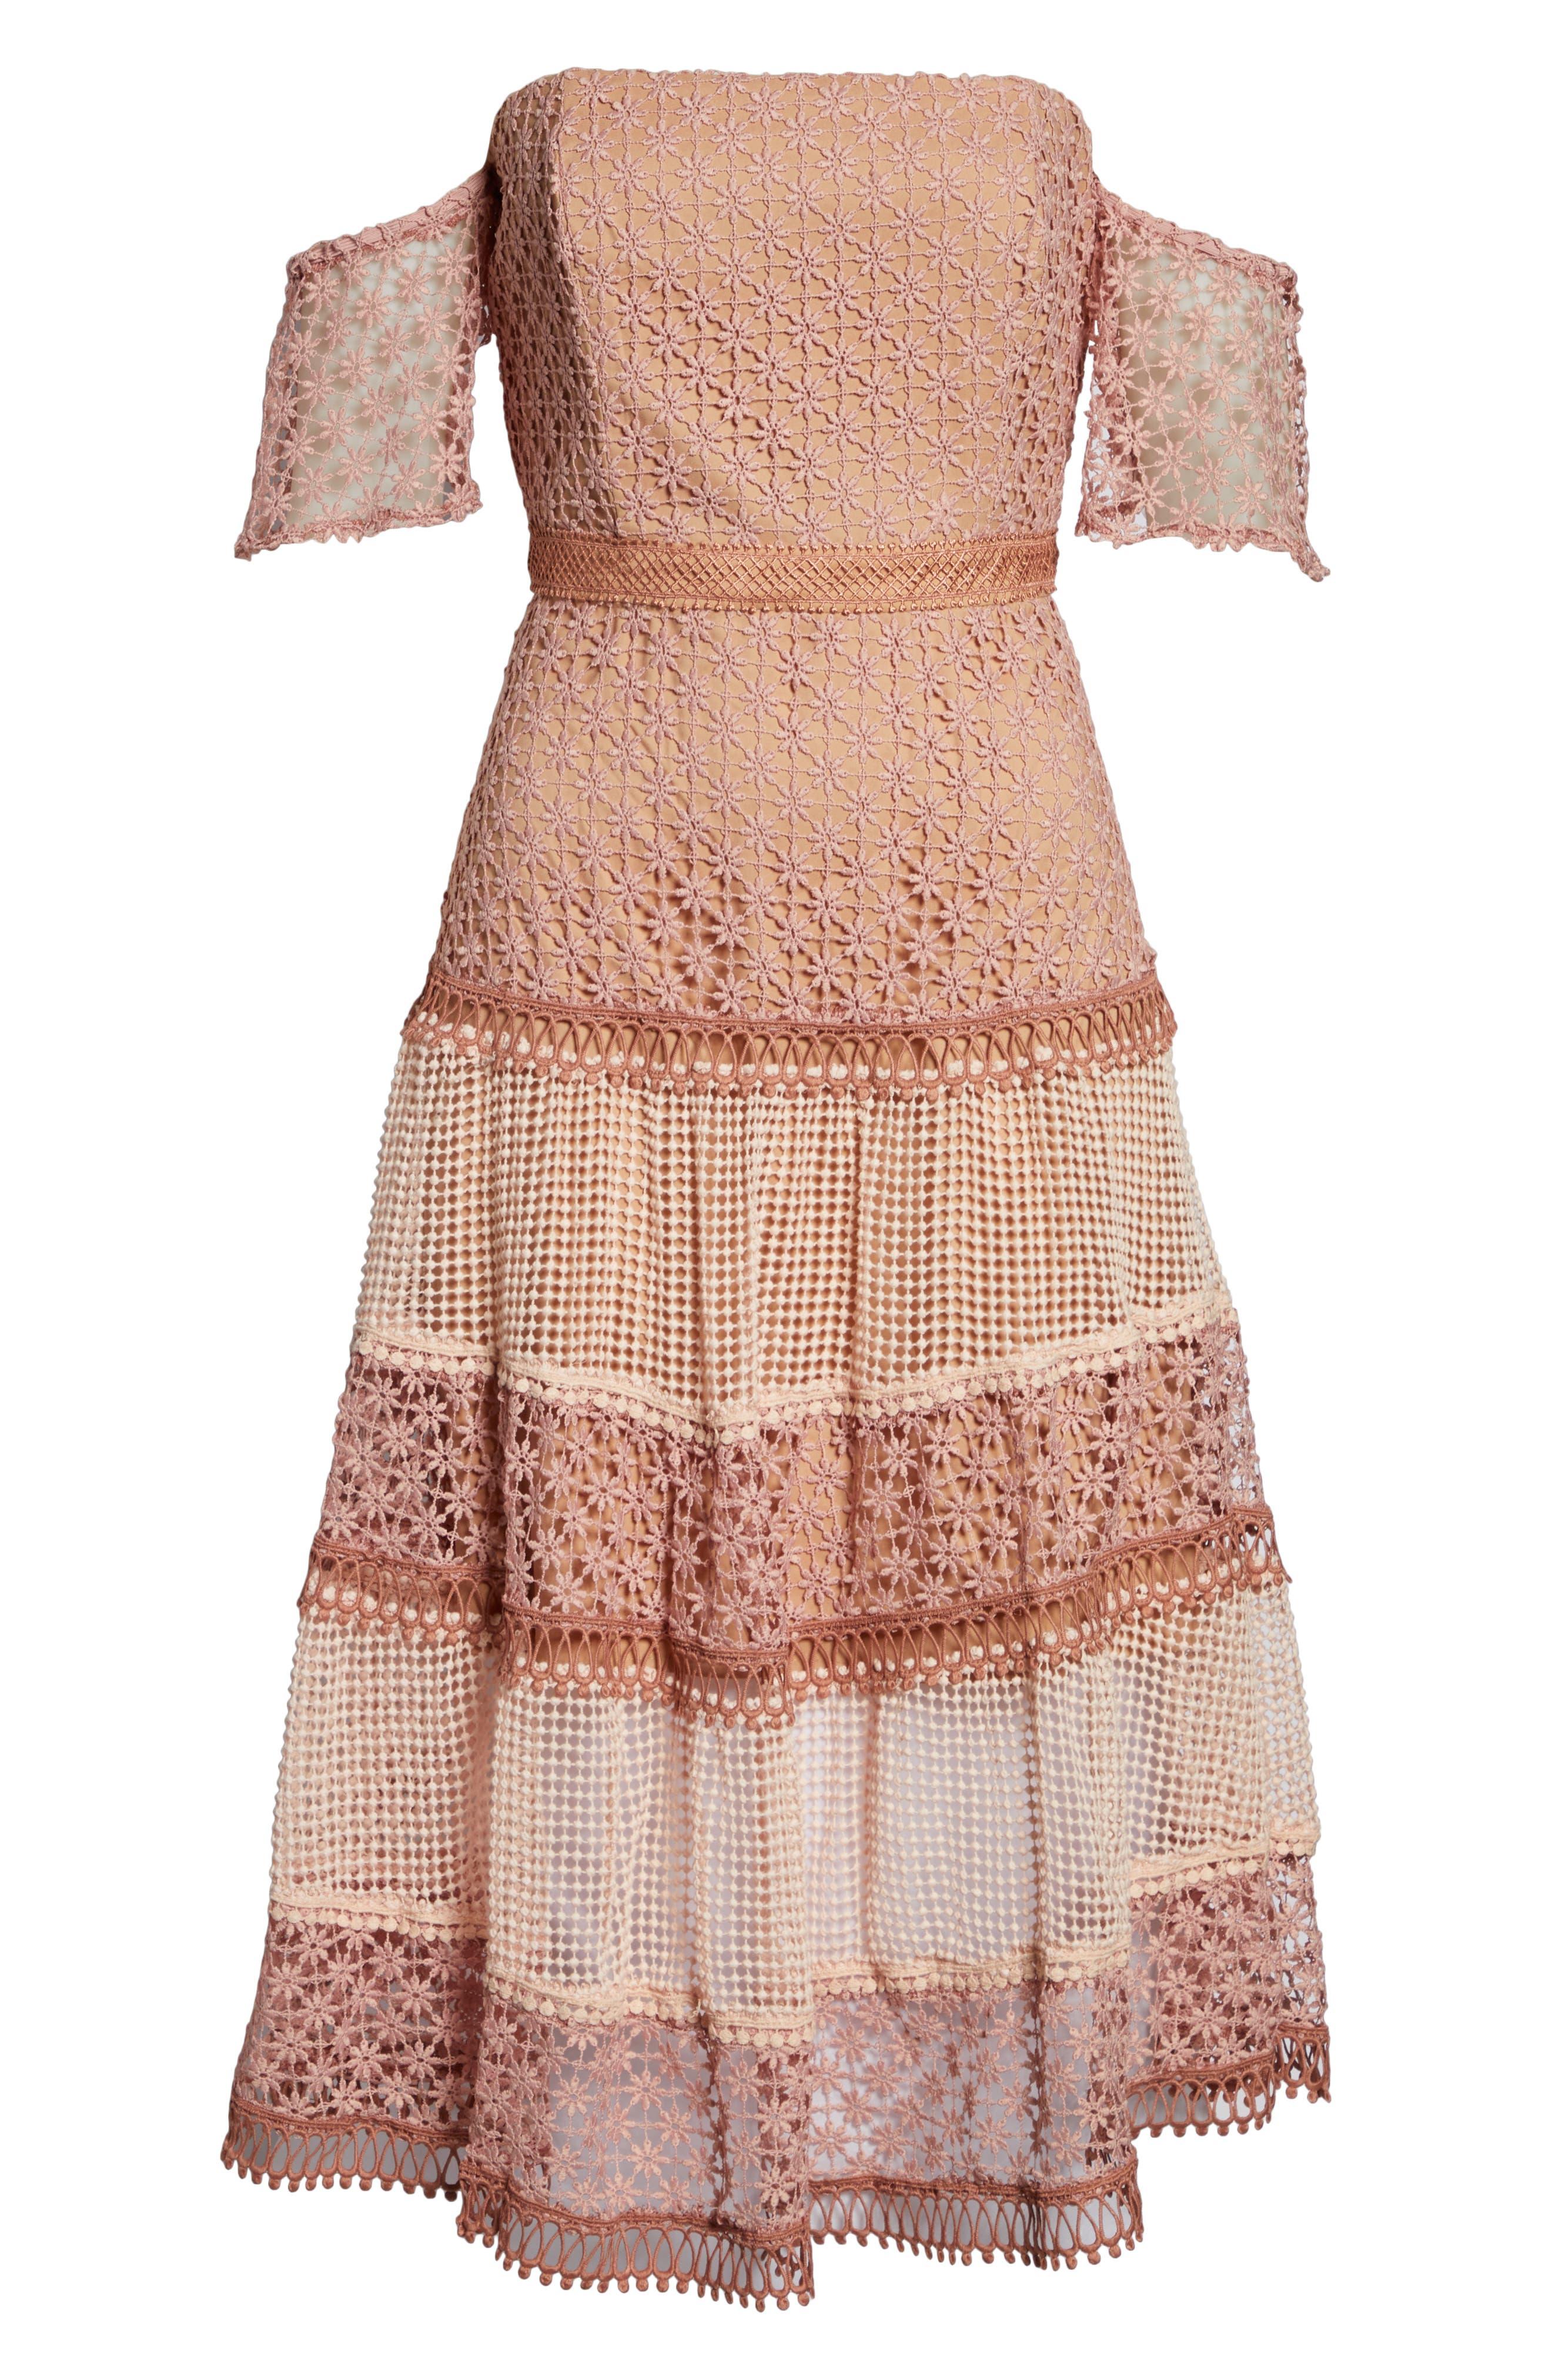 BARDOT, Kristen Off the Shoulder Lace Midi Dress, Alternate thumbnail 6, color, 680